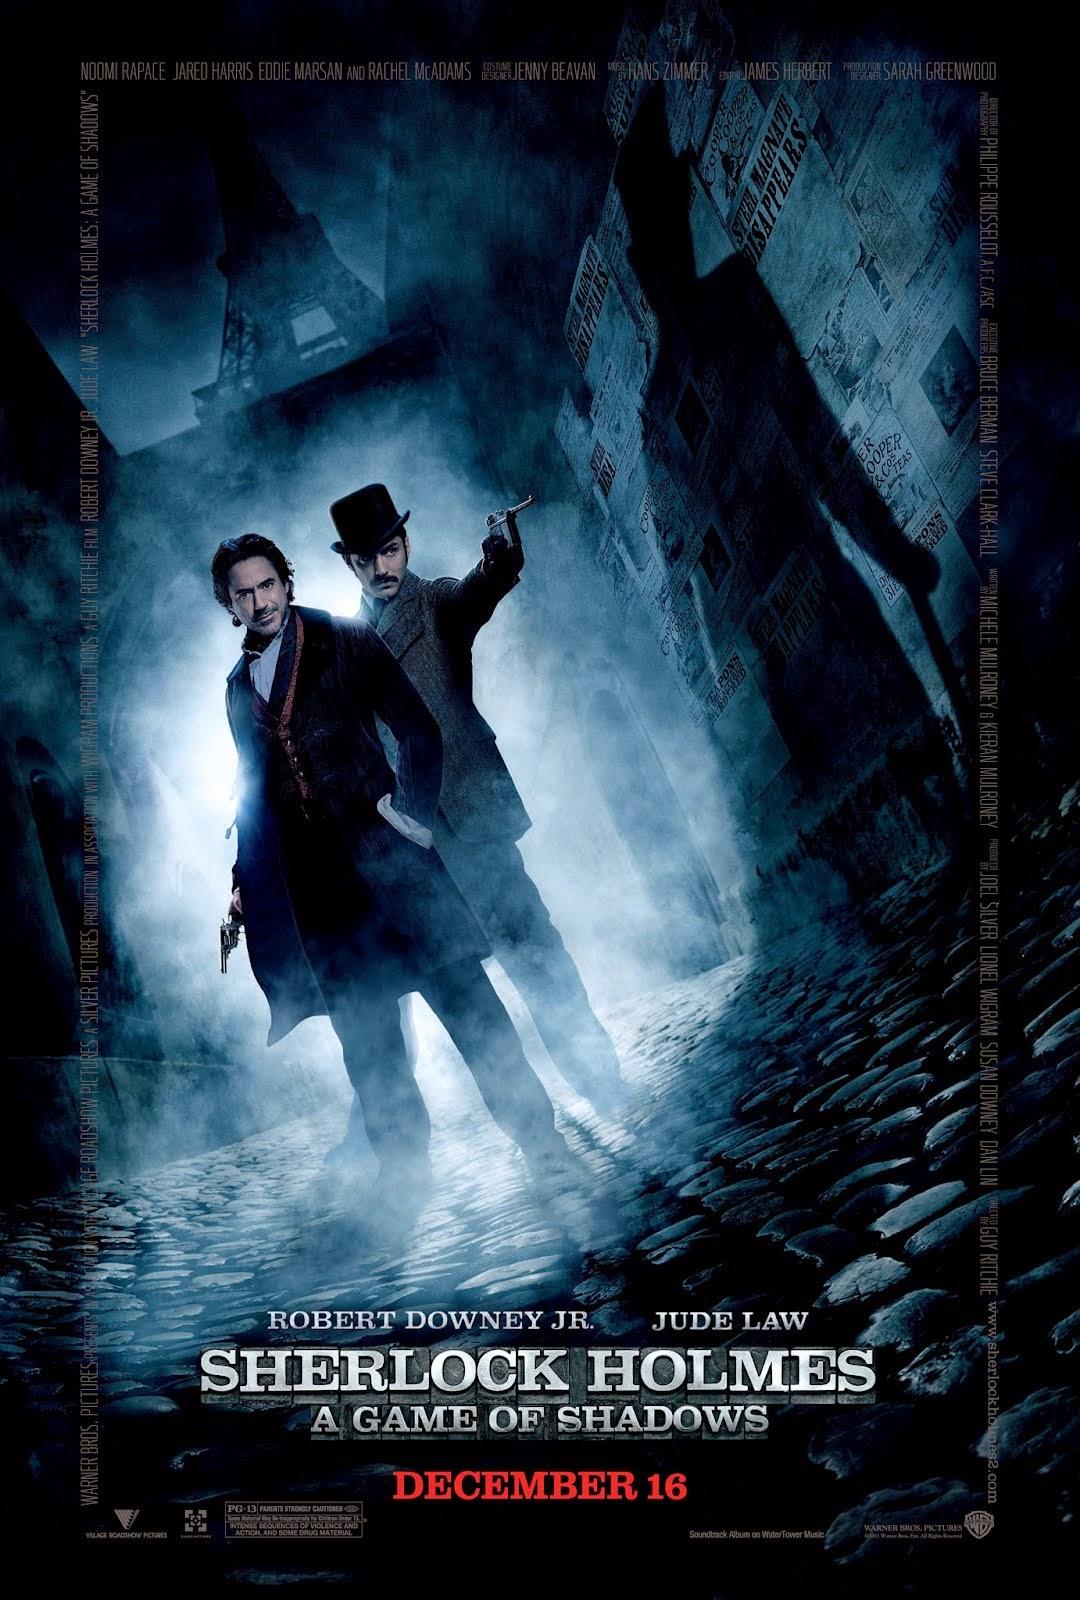 Sherlock Holmes 2 A Game Of Shadows เชอร์ล็อค โฮล์มส์ 2 เกมพญายมเงามรณะ [HD][พากย์ไทย]